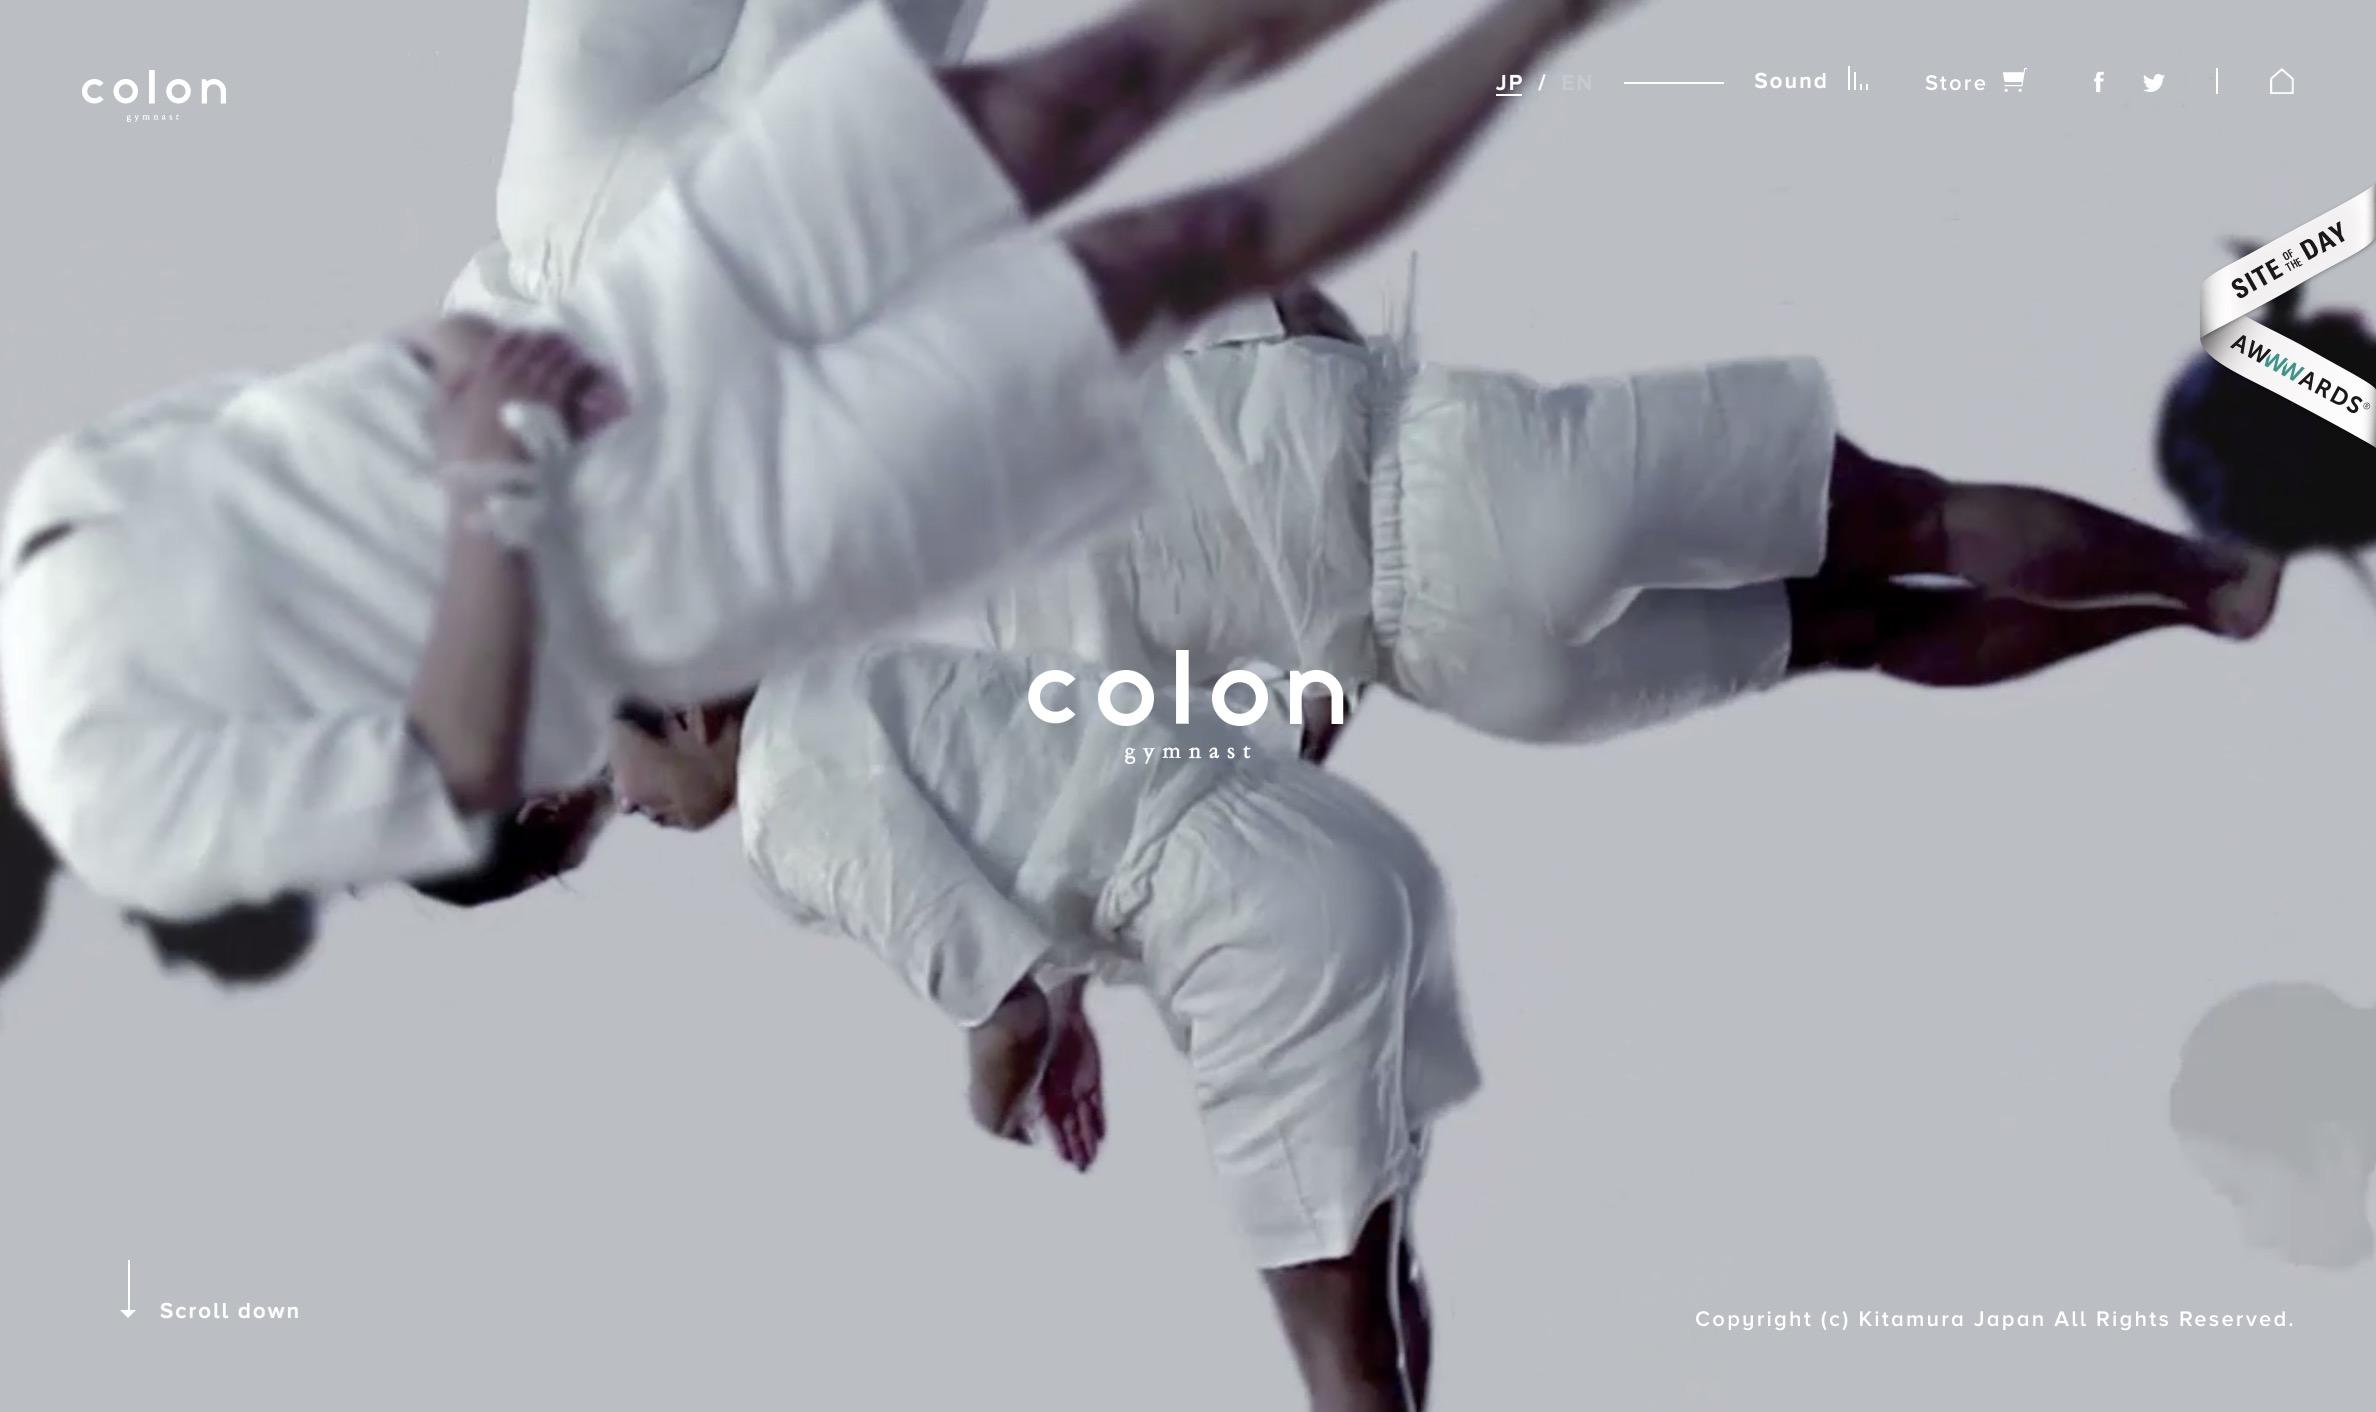 gymnast colon (ジムナストコロン )|まくらのキタムラ